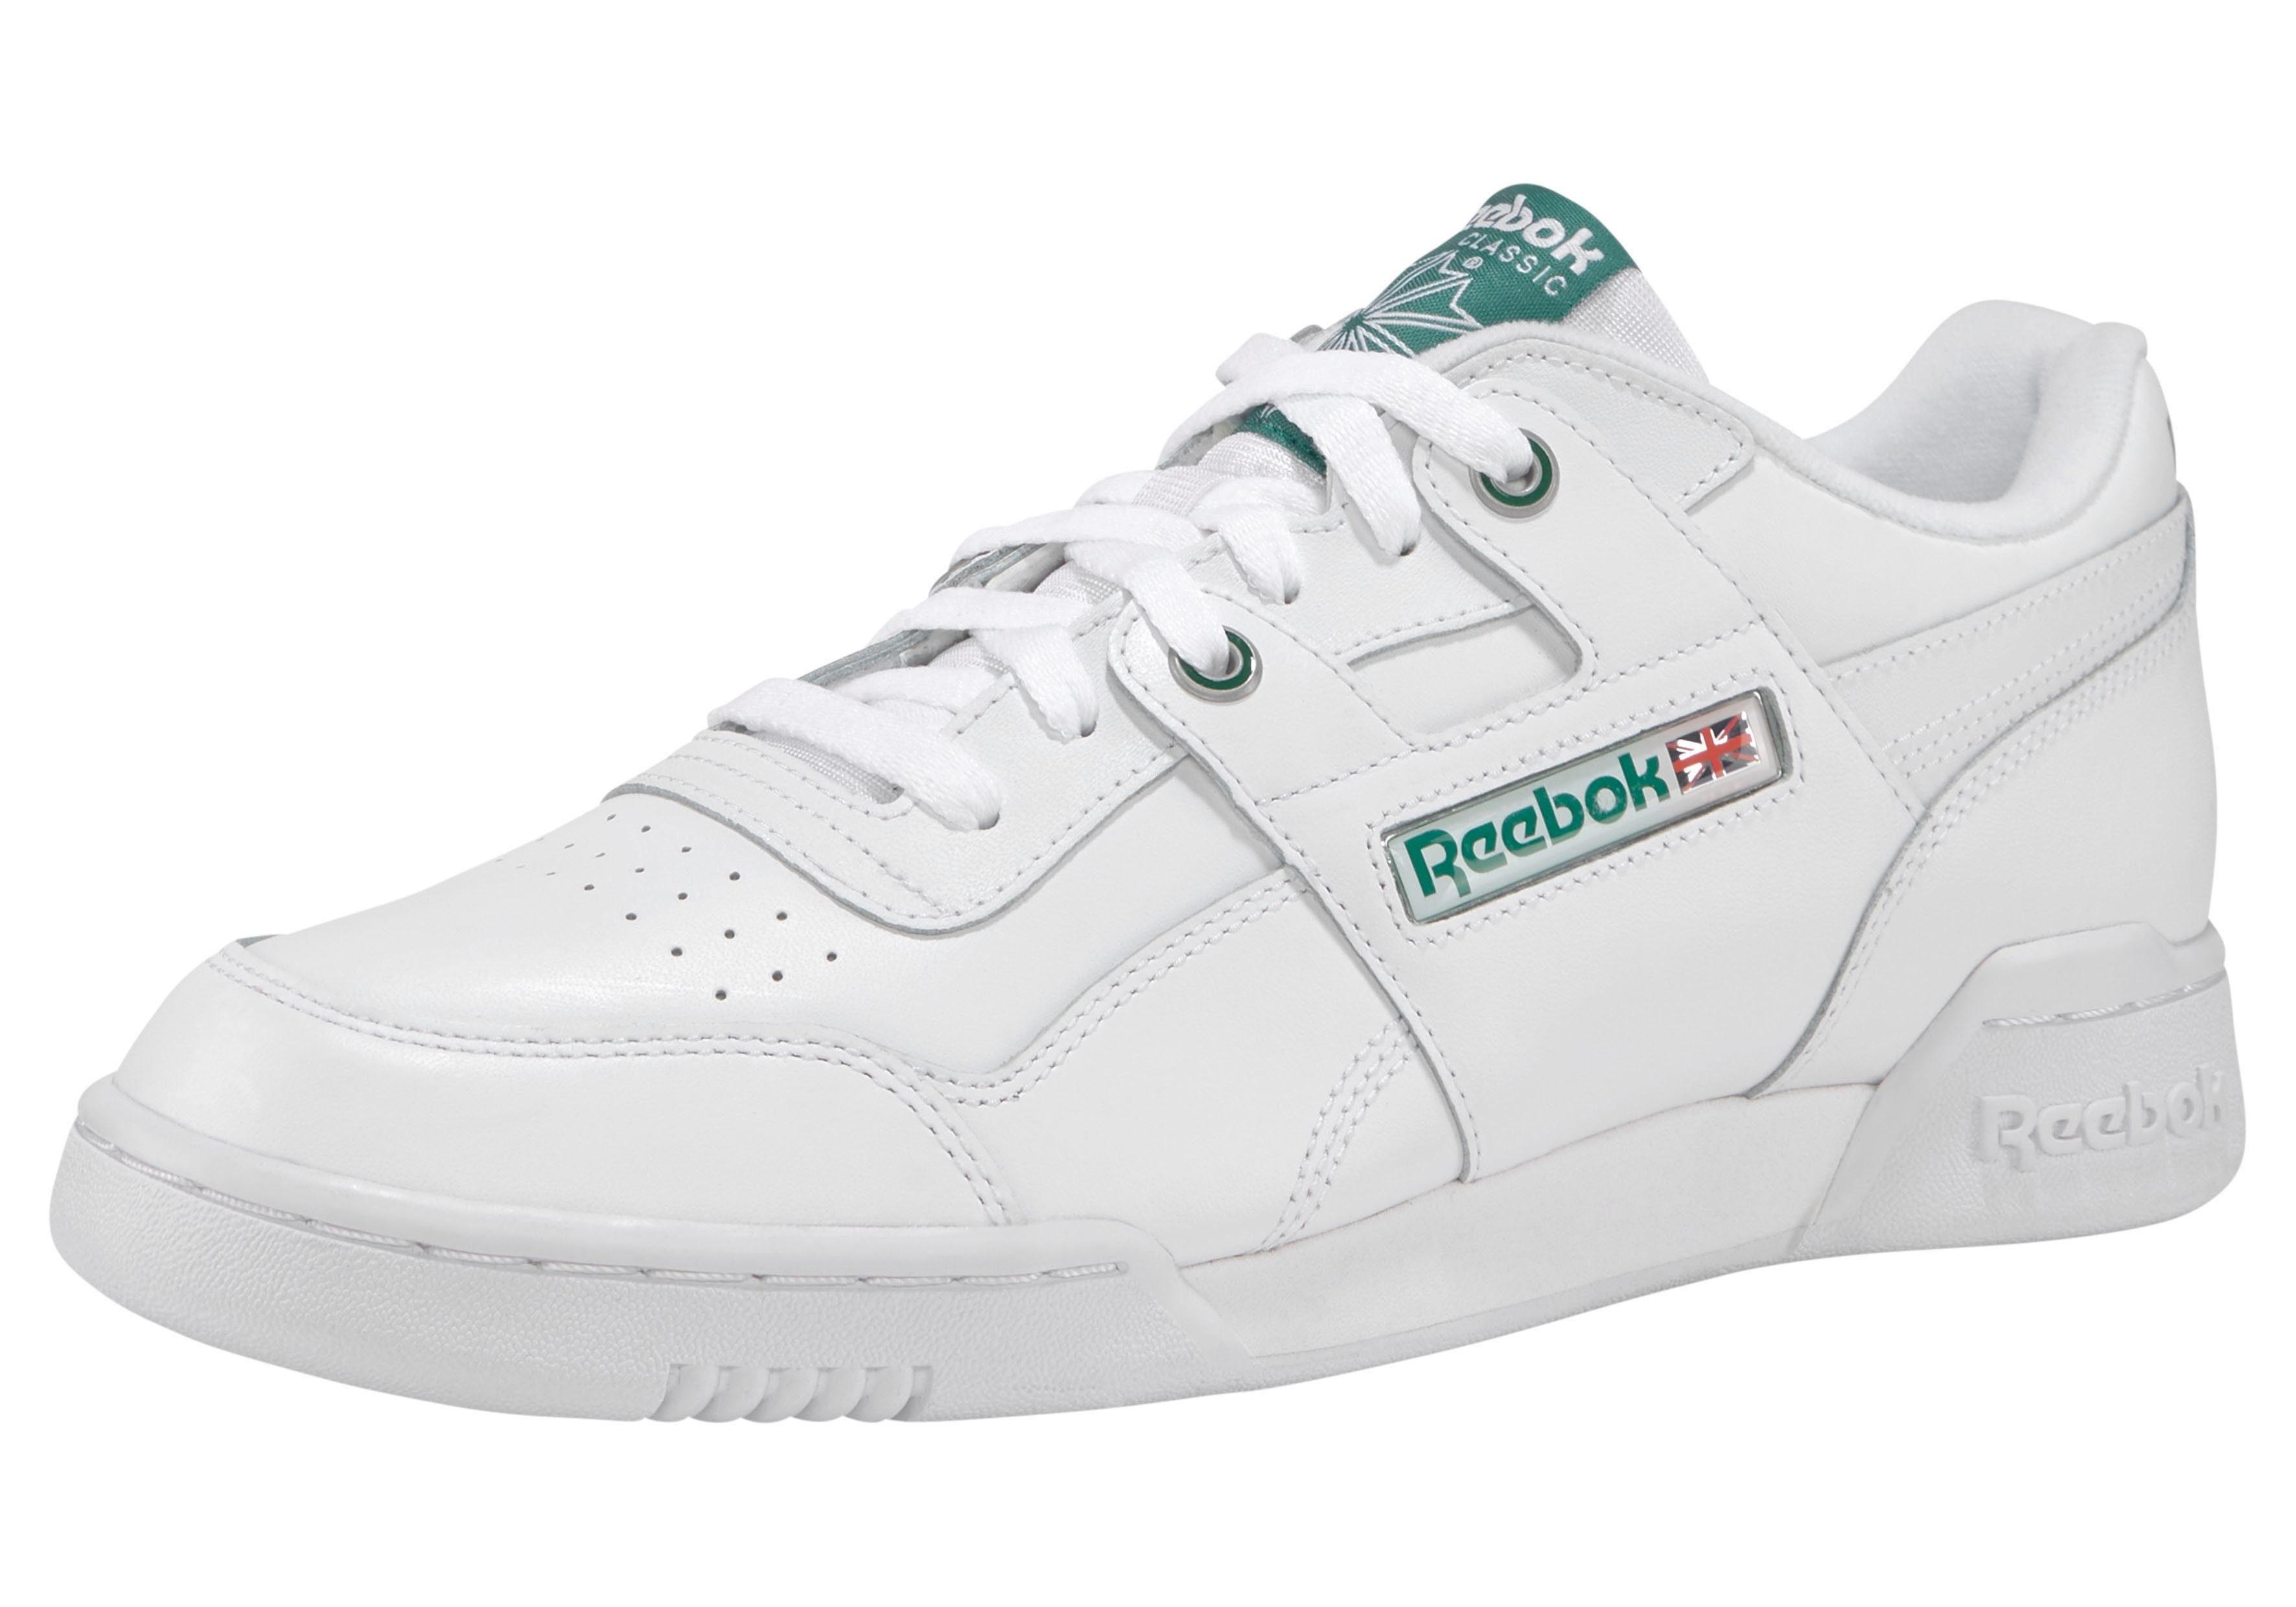 Reebok Classic »WORKOUT PLUS MU« Sneaker, Sportlicher Sneaker von Reebok Classic online kaufen   OTTO